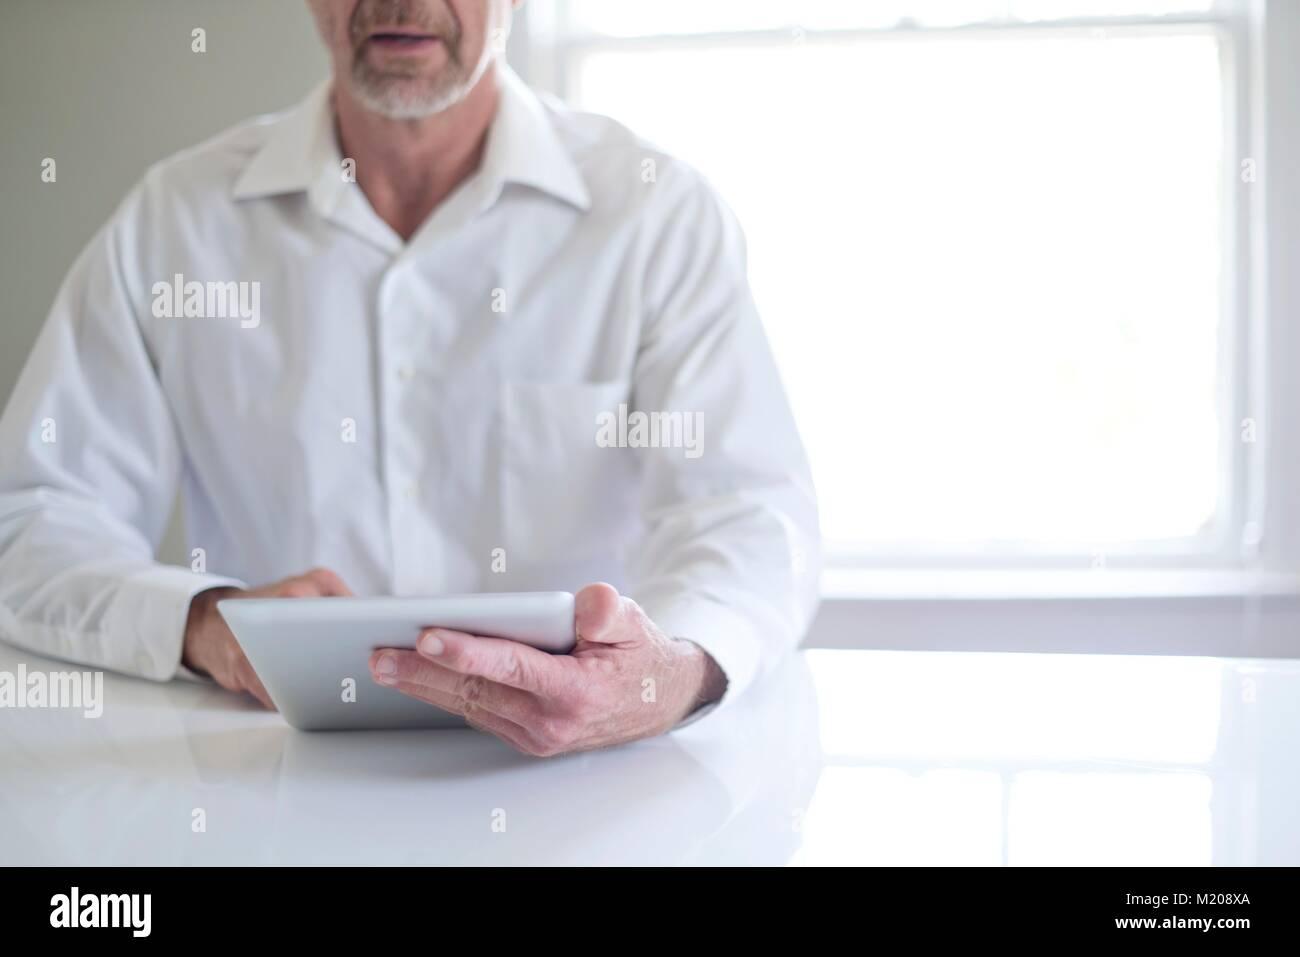 Senior man using digital tablet. - Stock Image